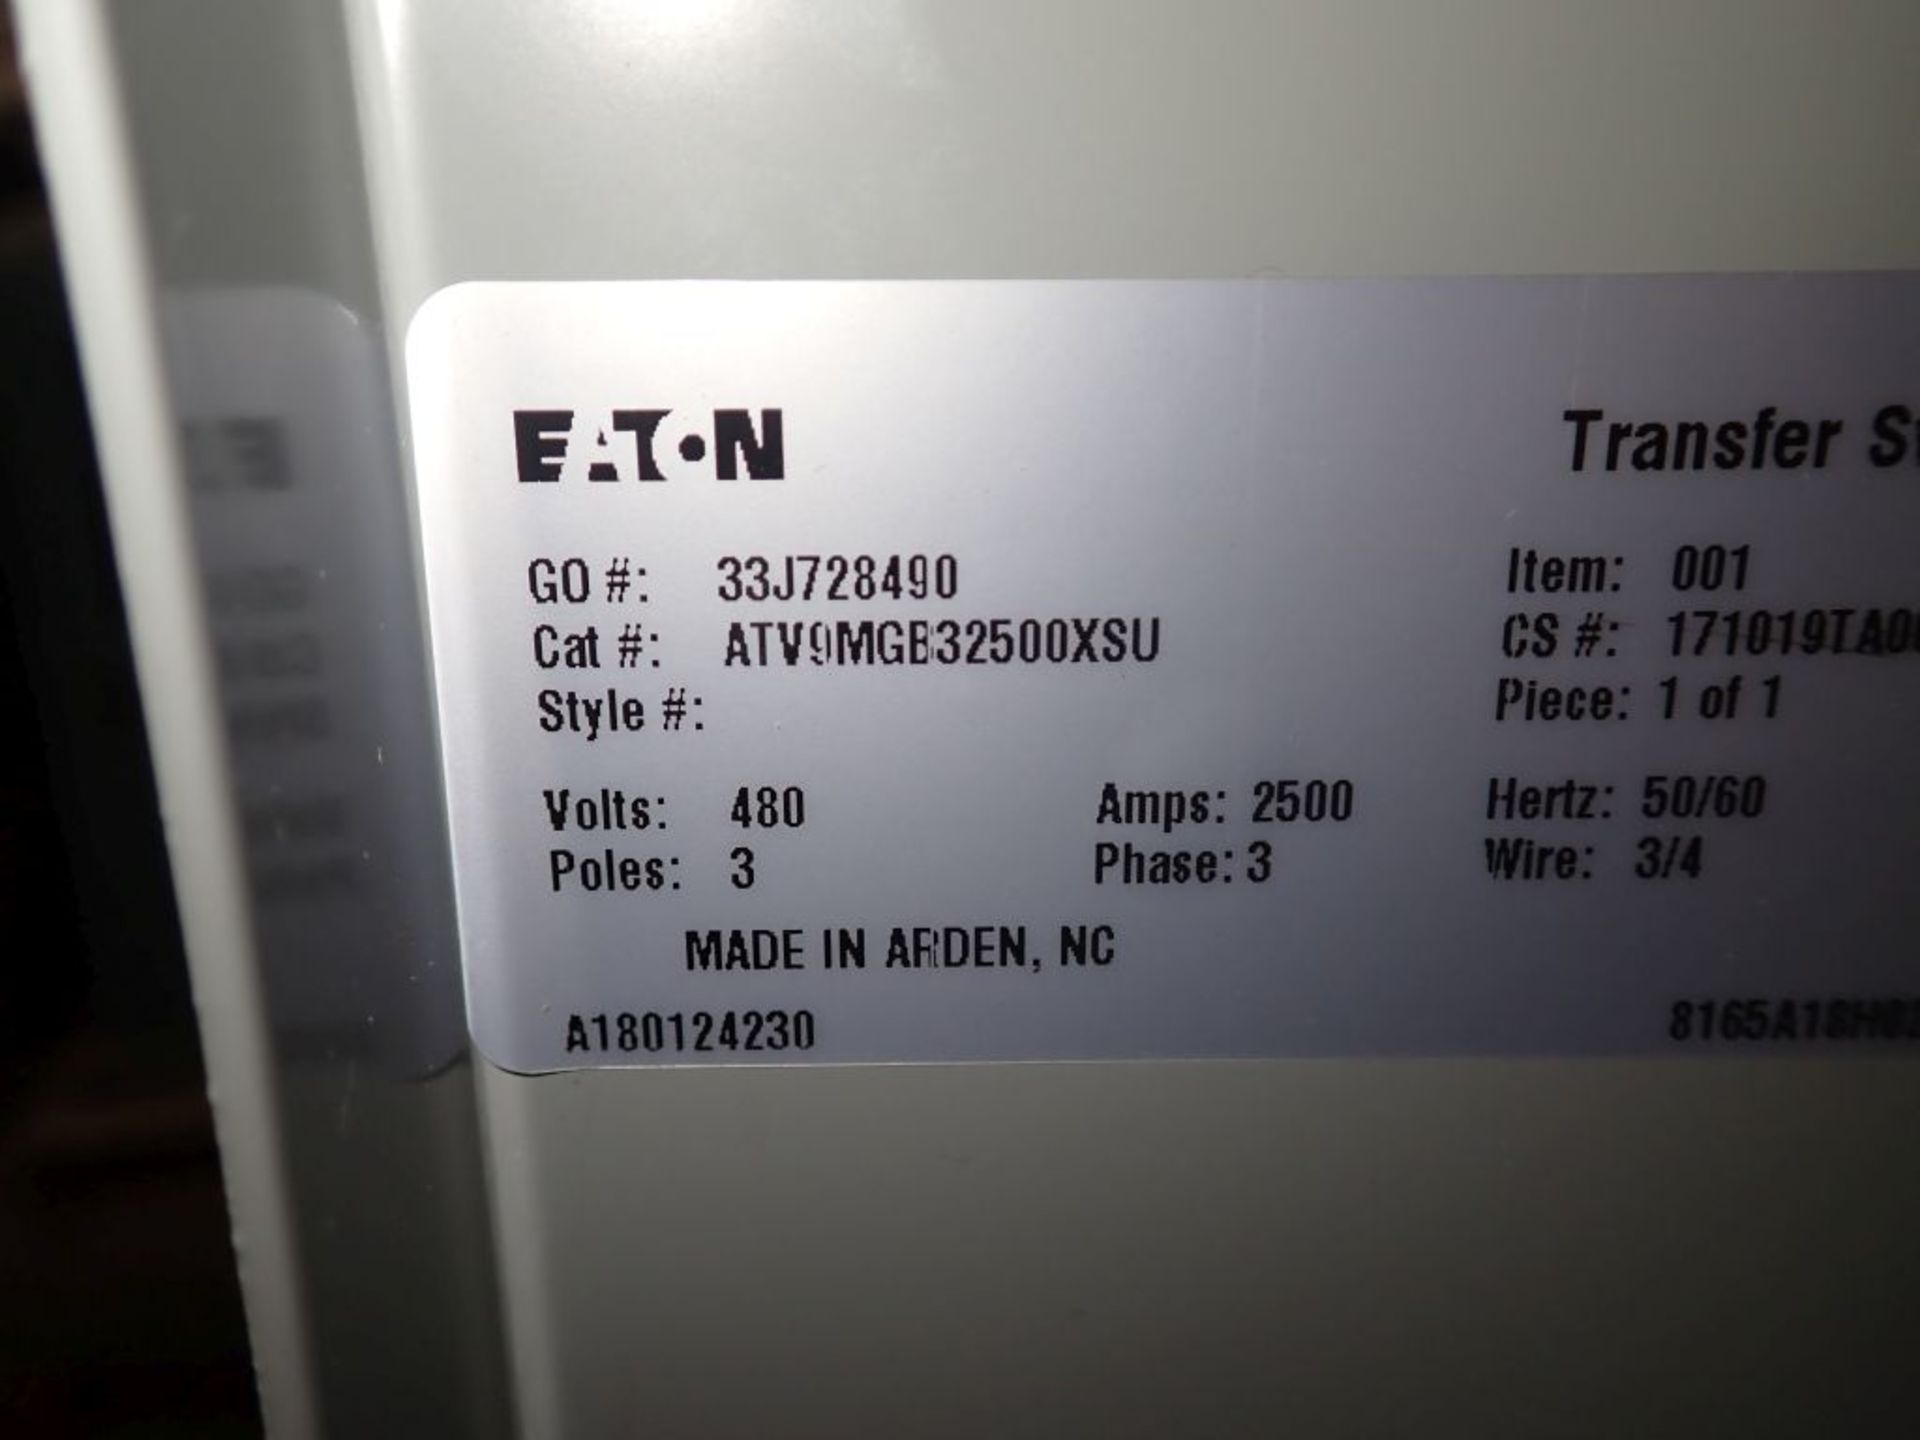 Eaton Transfer Switch | Cat No. ATV9MGB32500XSU; 480V; 3 PH; 2500A; (2) Eaton Magnum DS Circuit - Image 39 of 50